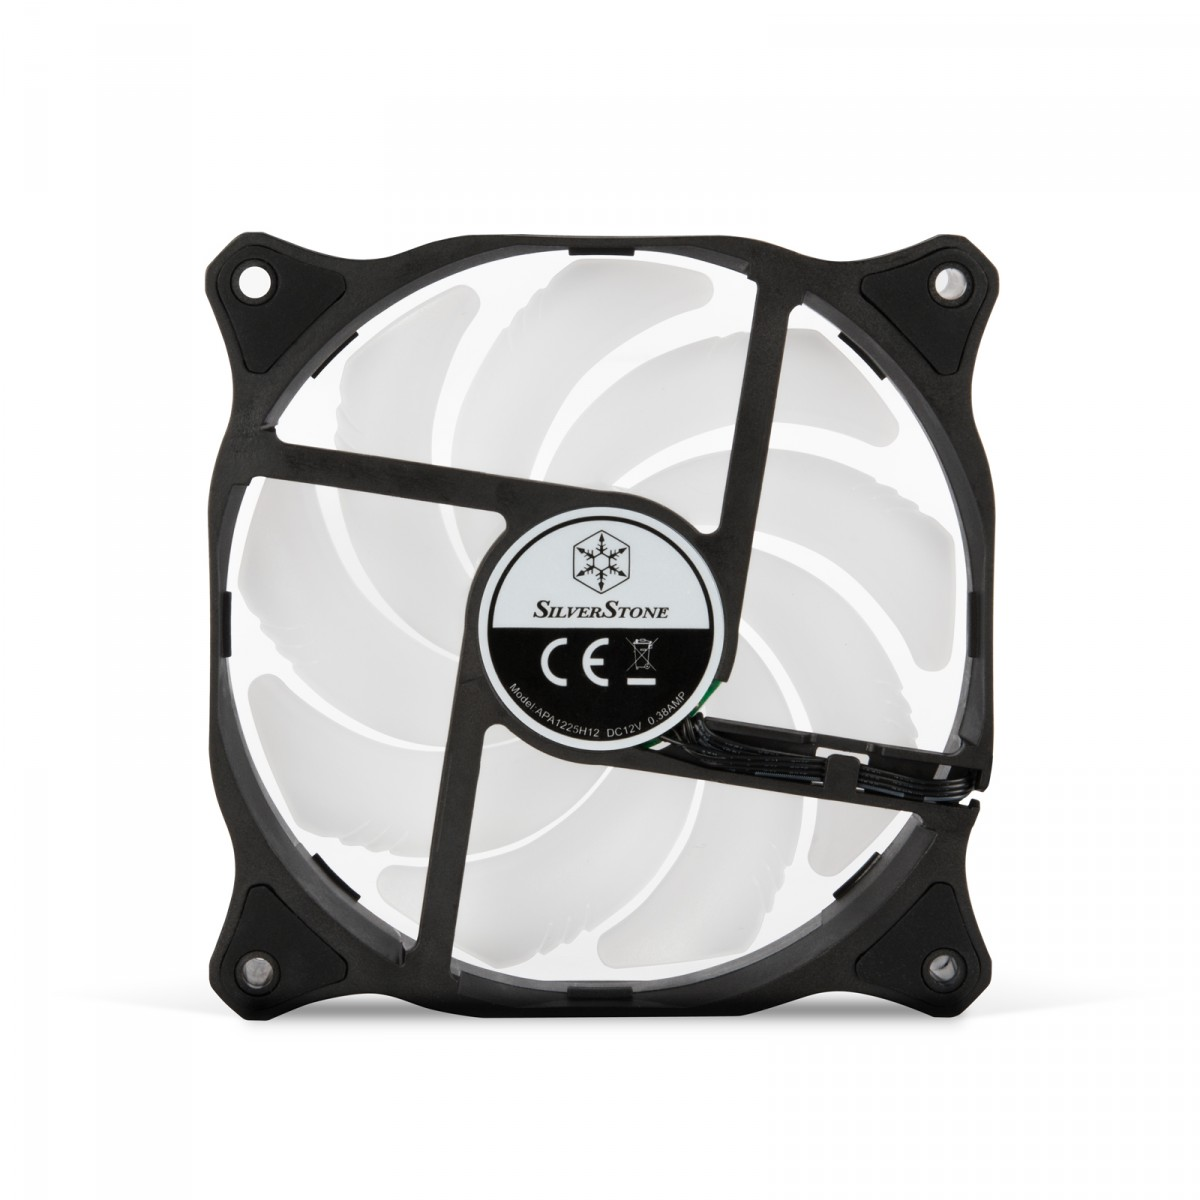 Cooler para Gabinete SilverStone Air Blazer 120R, ARGB, 120mm, SST-AB120R-ARGB